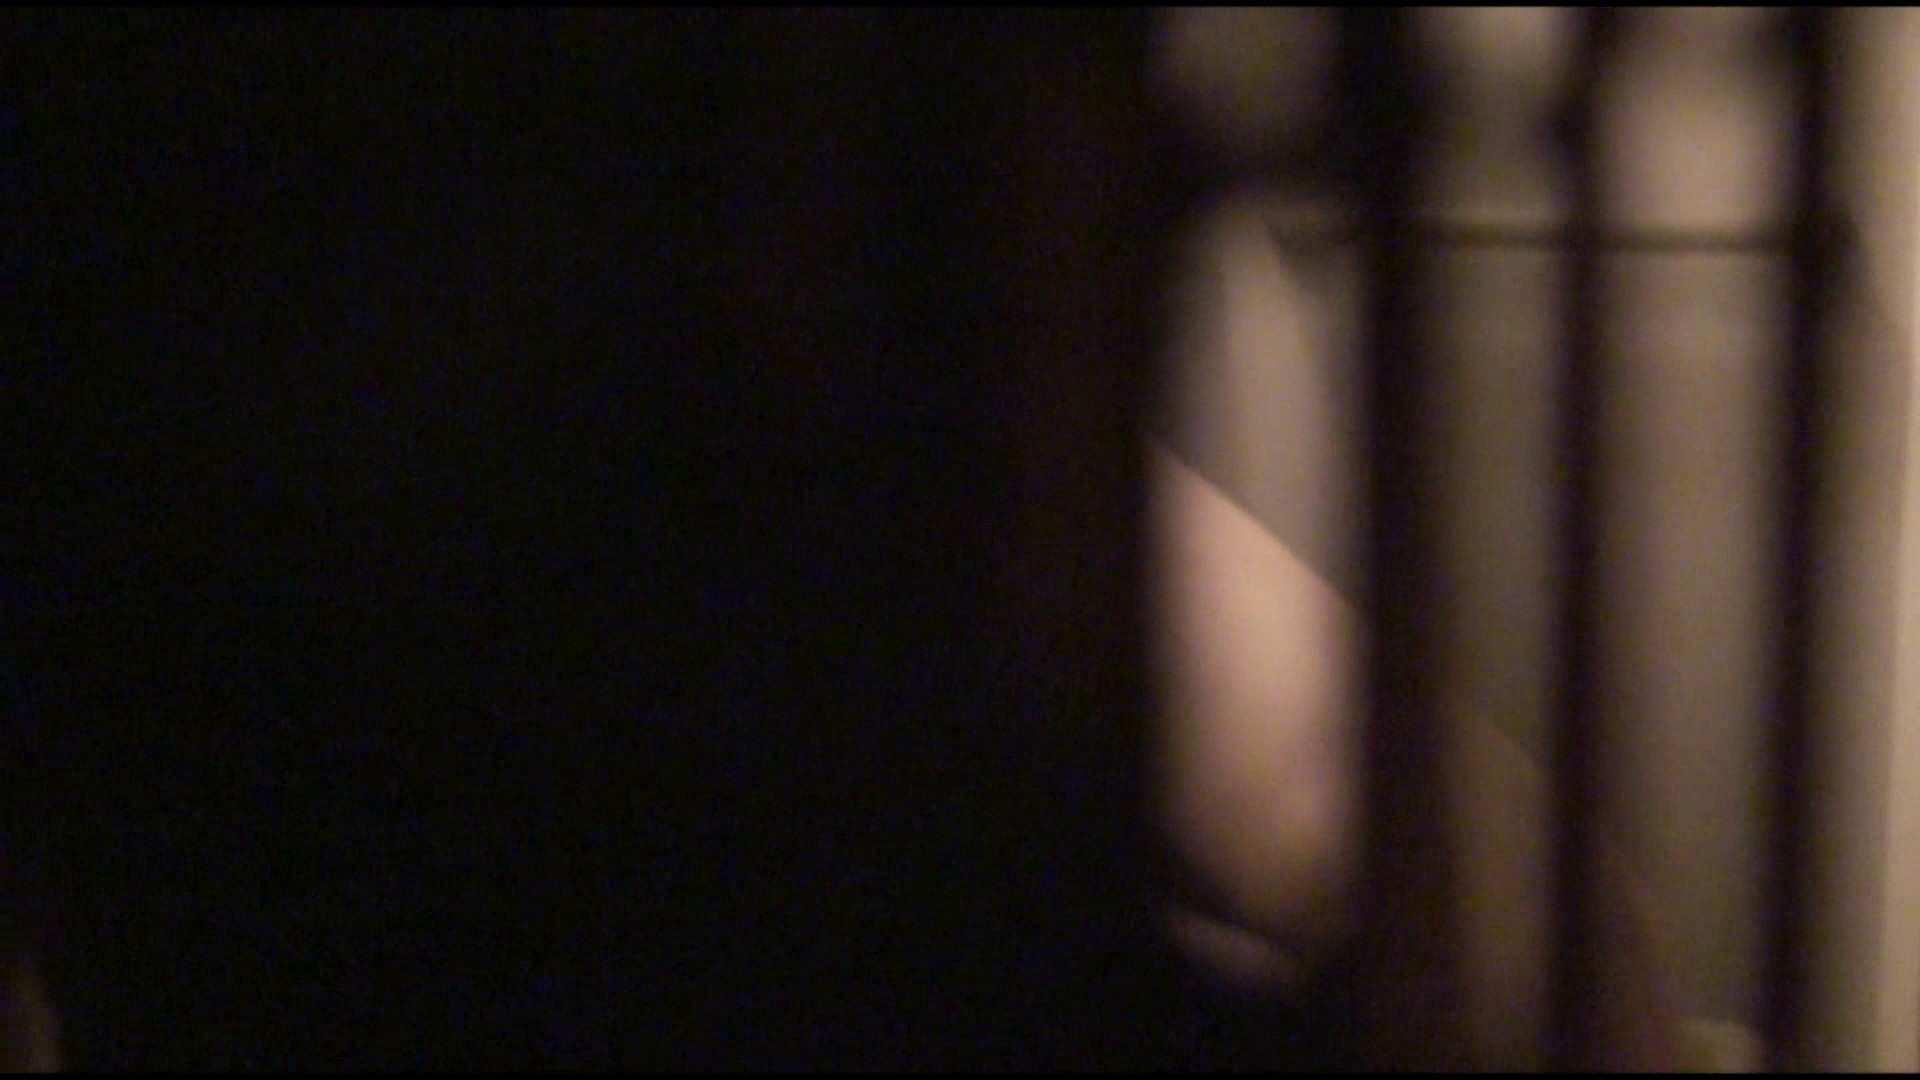 vol.05最高の極上美人!可愛い彼女の裸体をどうぞ!風呂上り鏡チェックも必見! 美人  99PIX 77